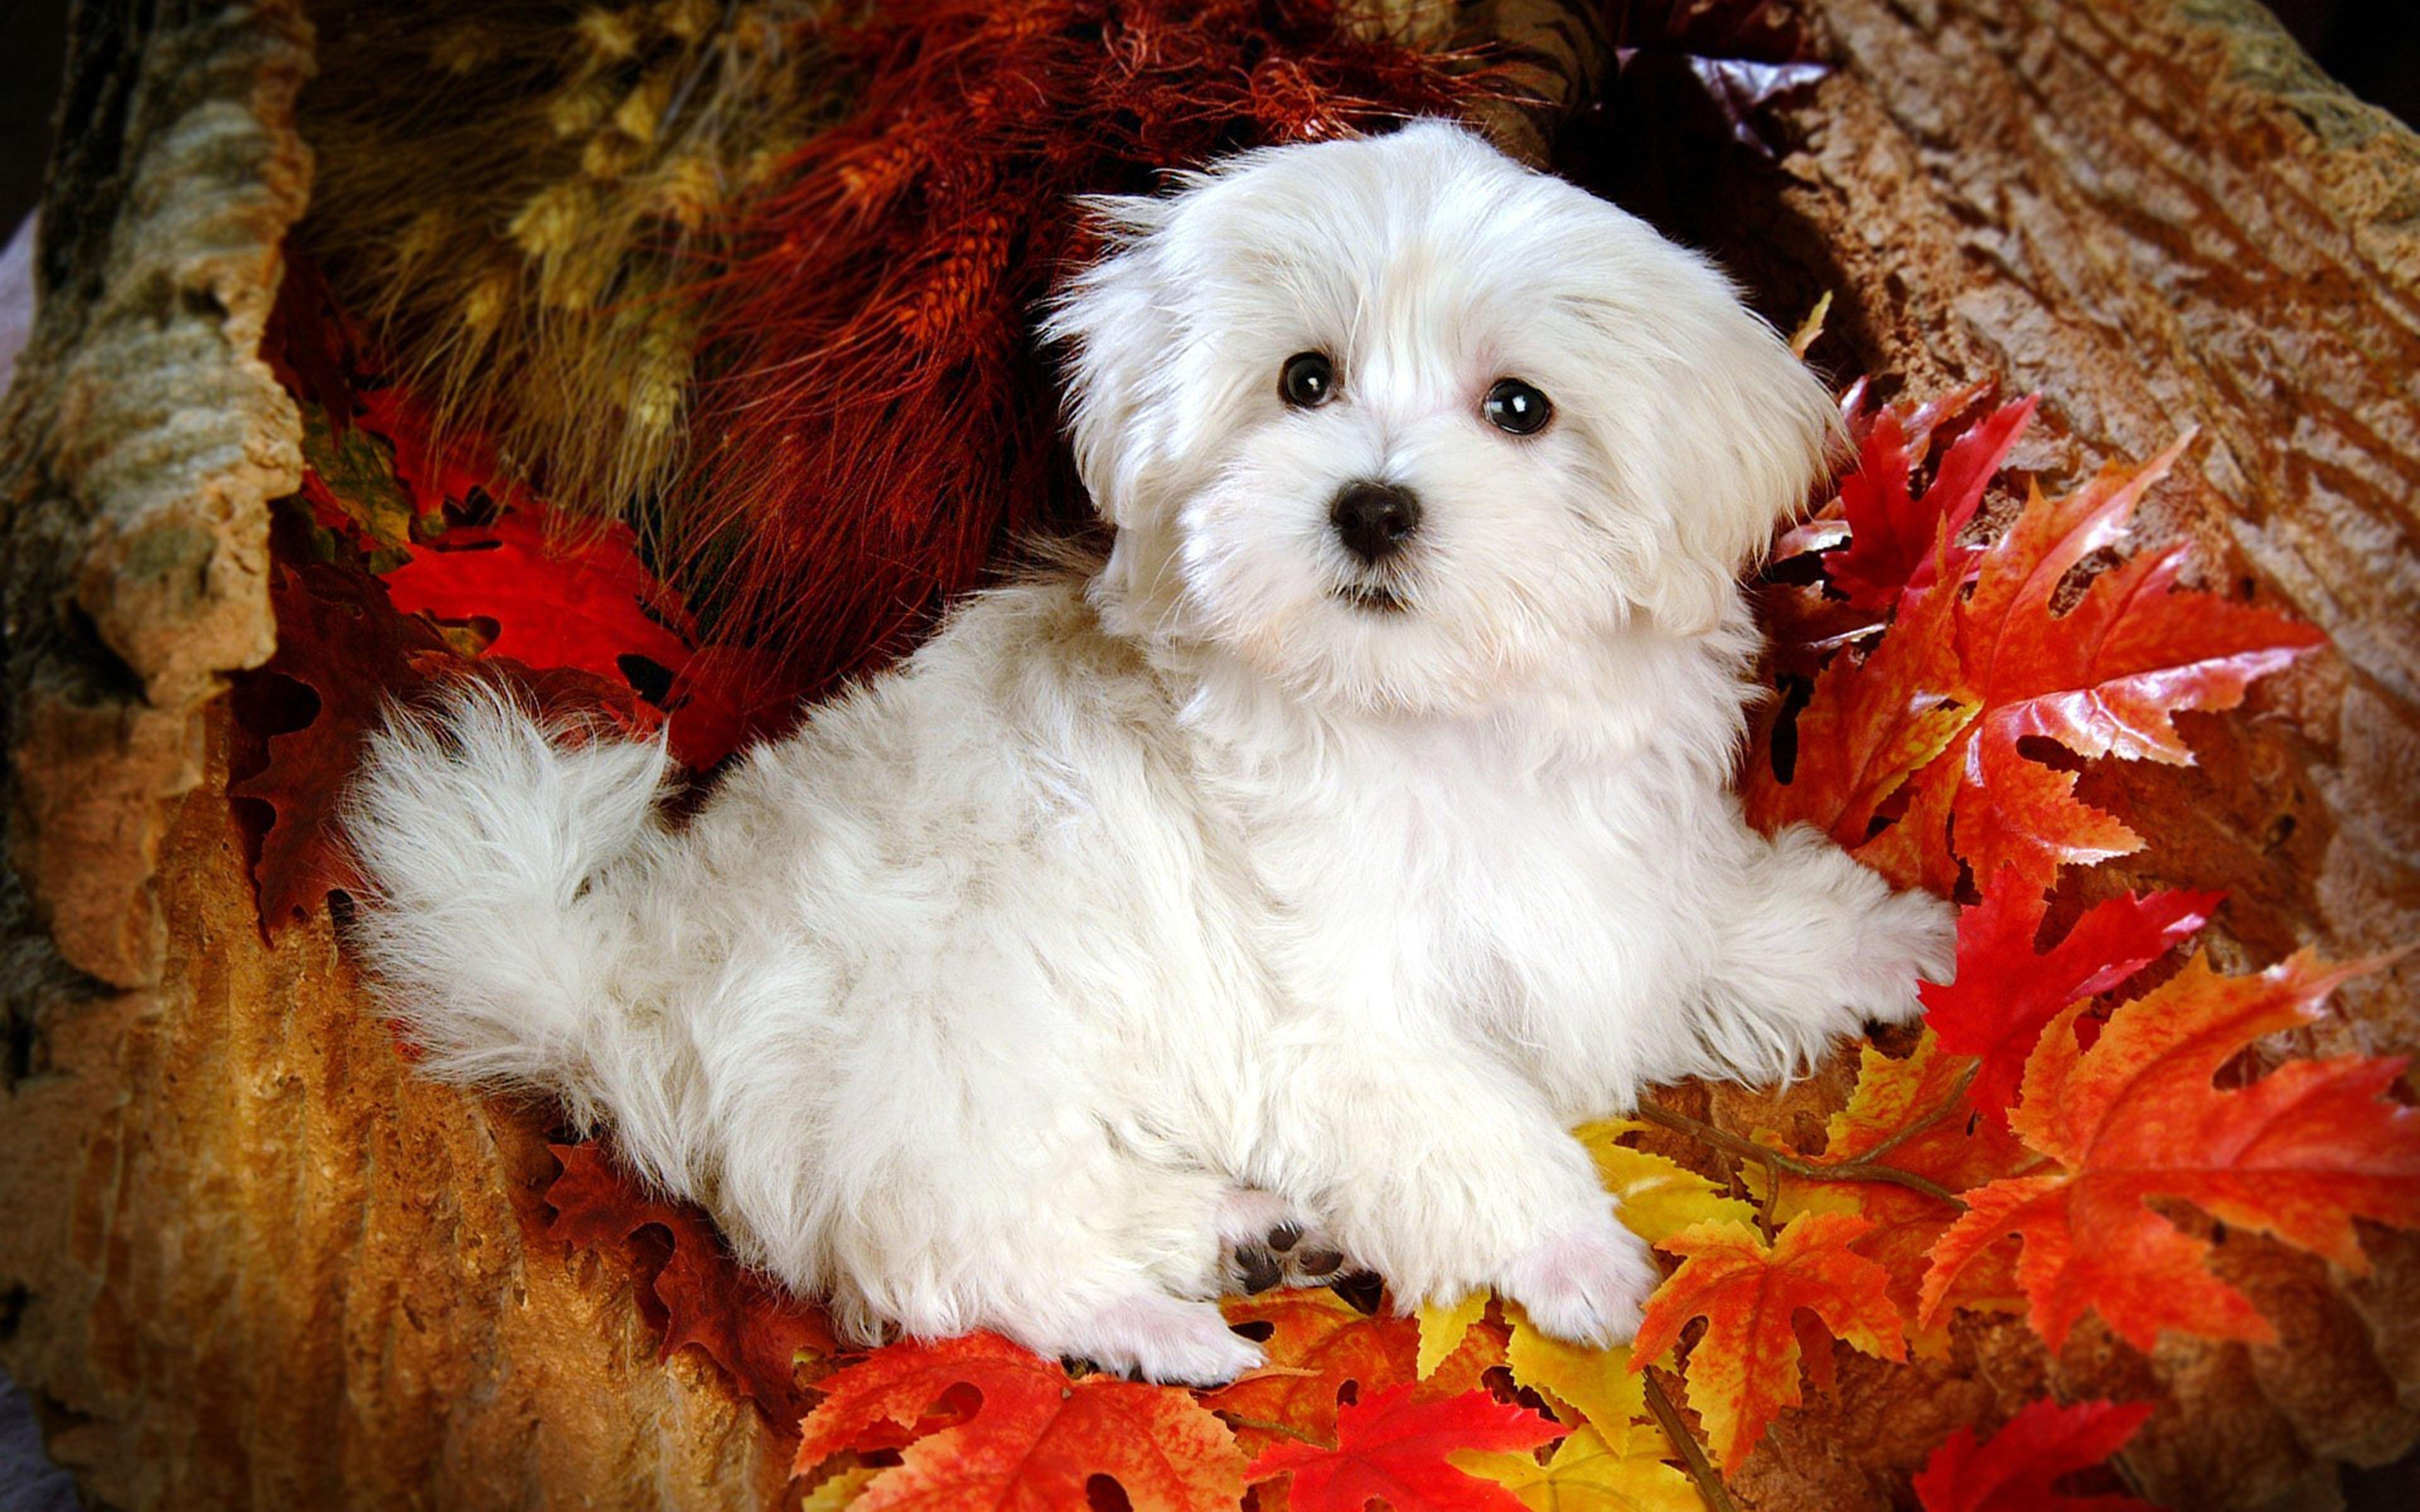 White Cute Dog 4k Wallpaper